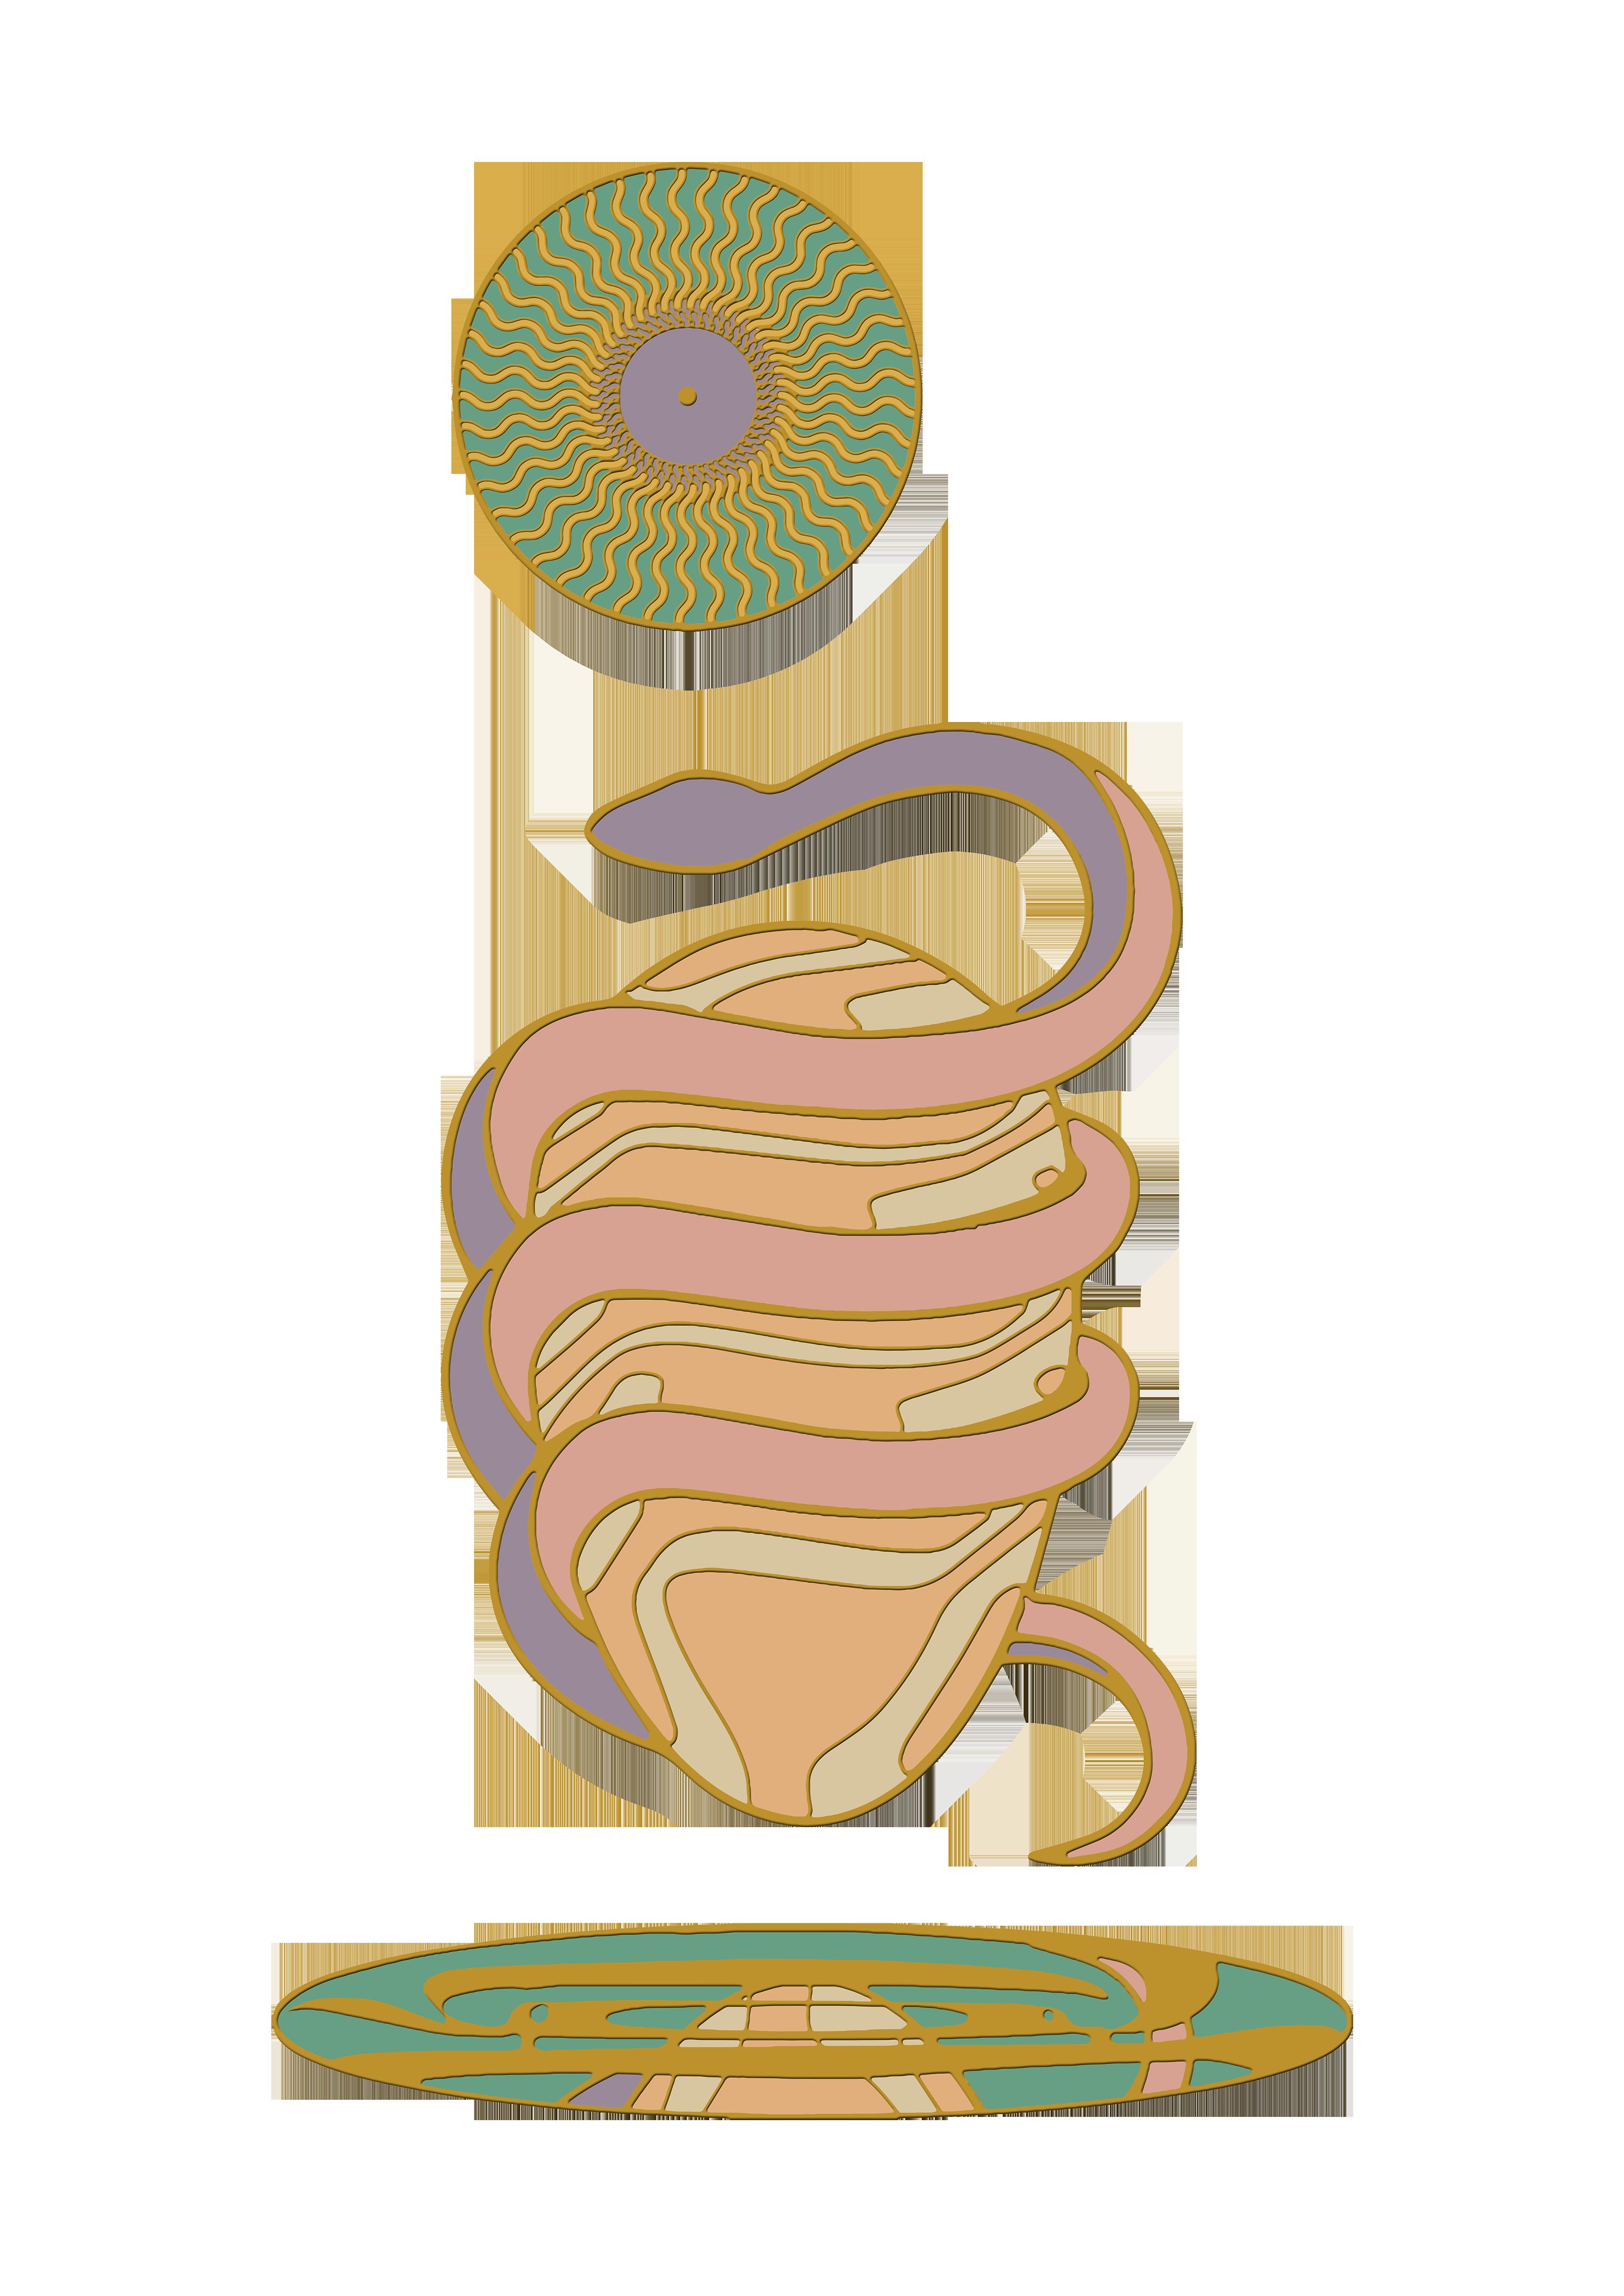 Cosmic egg front